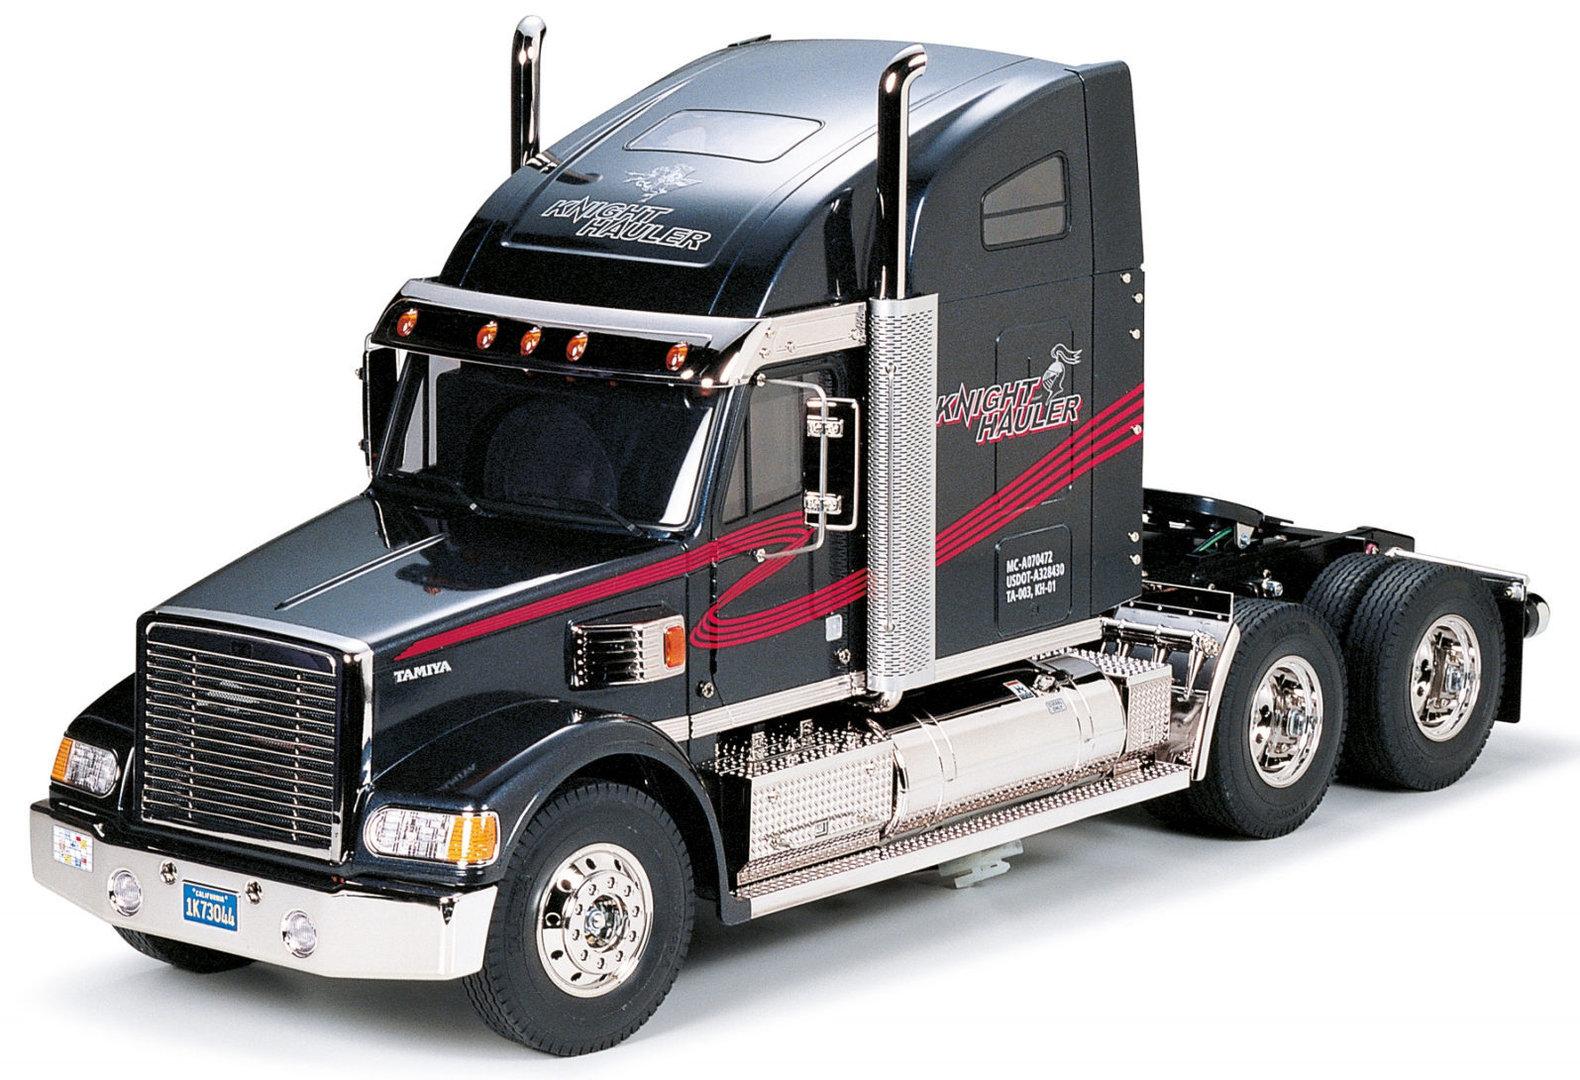 tamiya truck knight hauler rc modellbau truck 56314. Black Bedroom Furniture Sets. Home Design Ideas